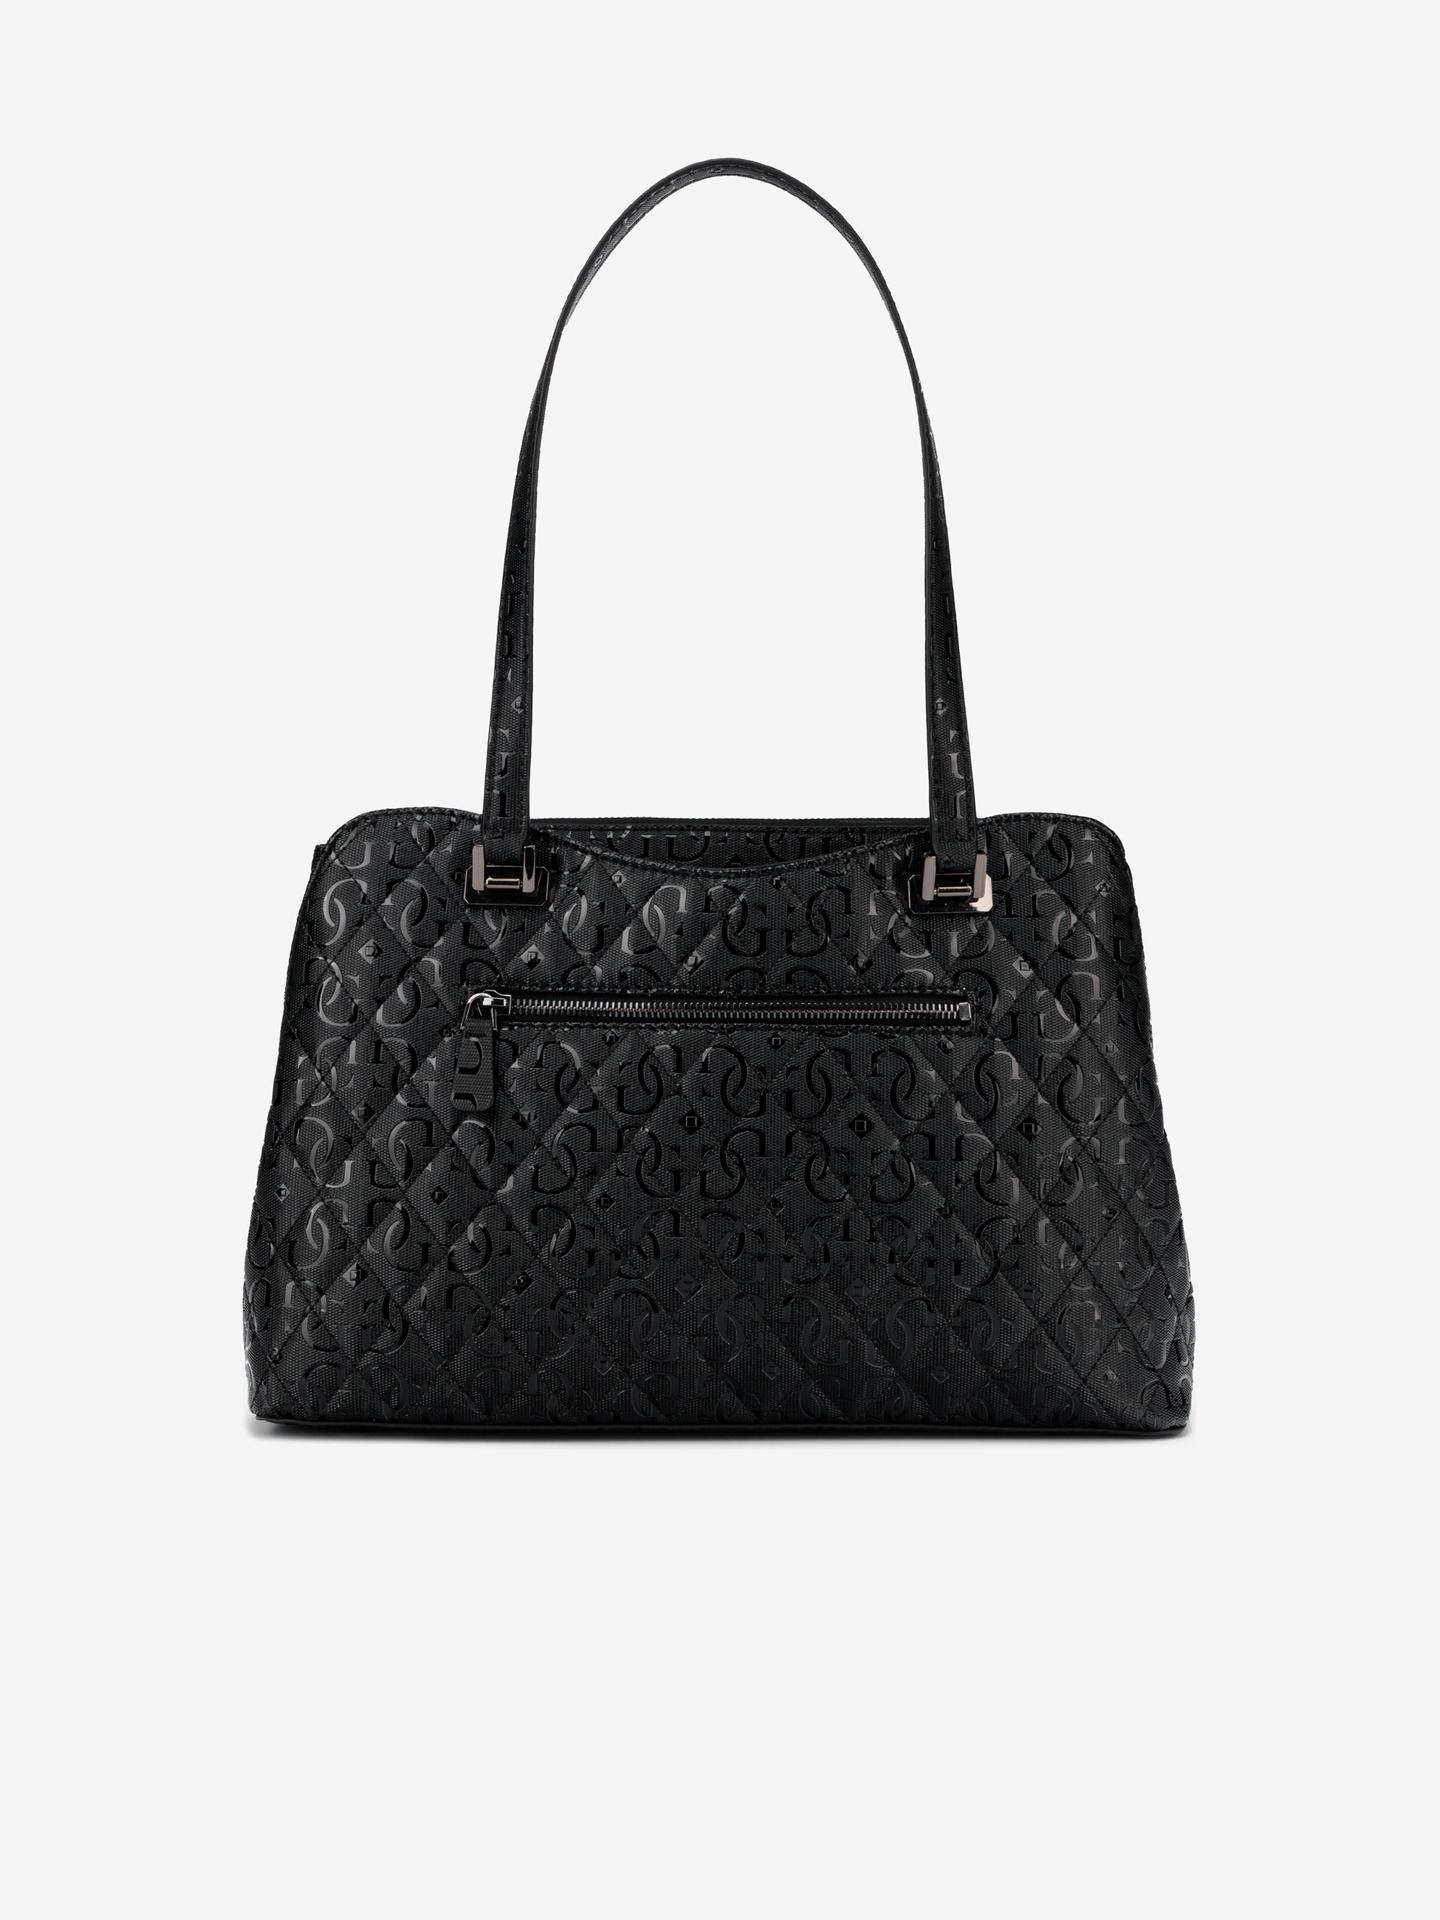 Guess black handbag Lola Glossy Logo Maxi